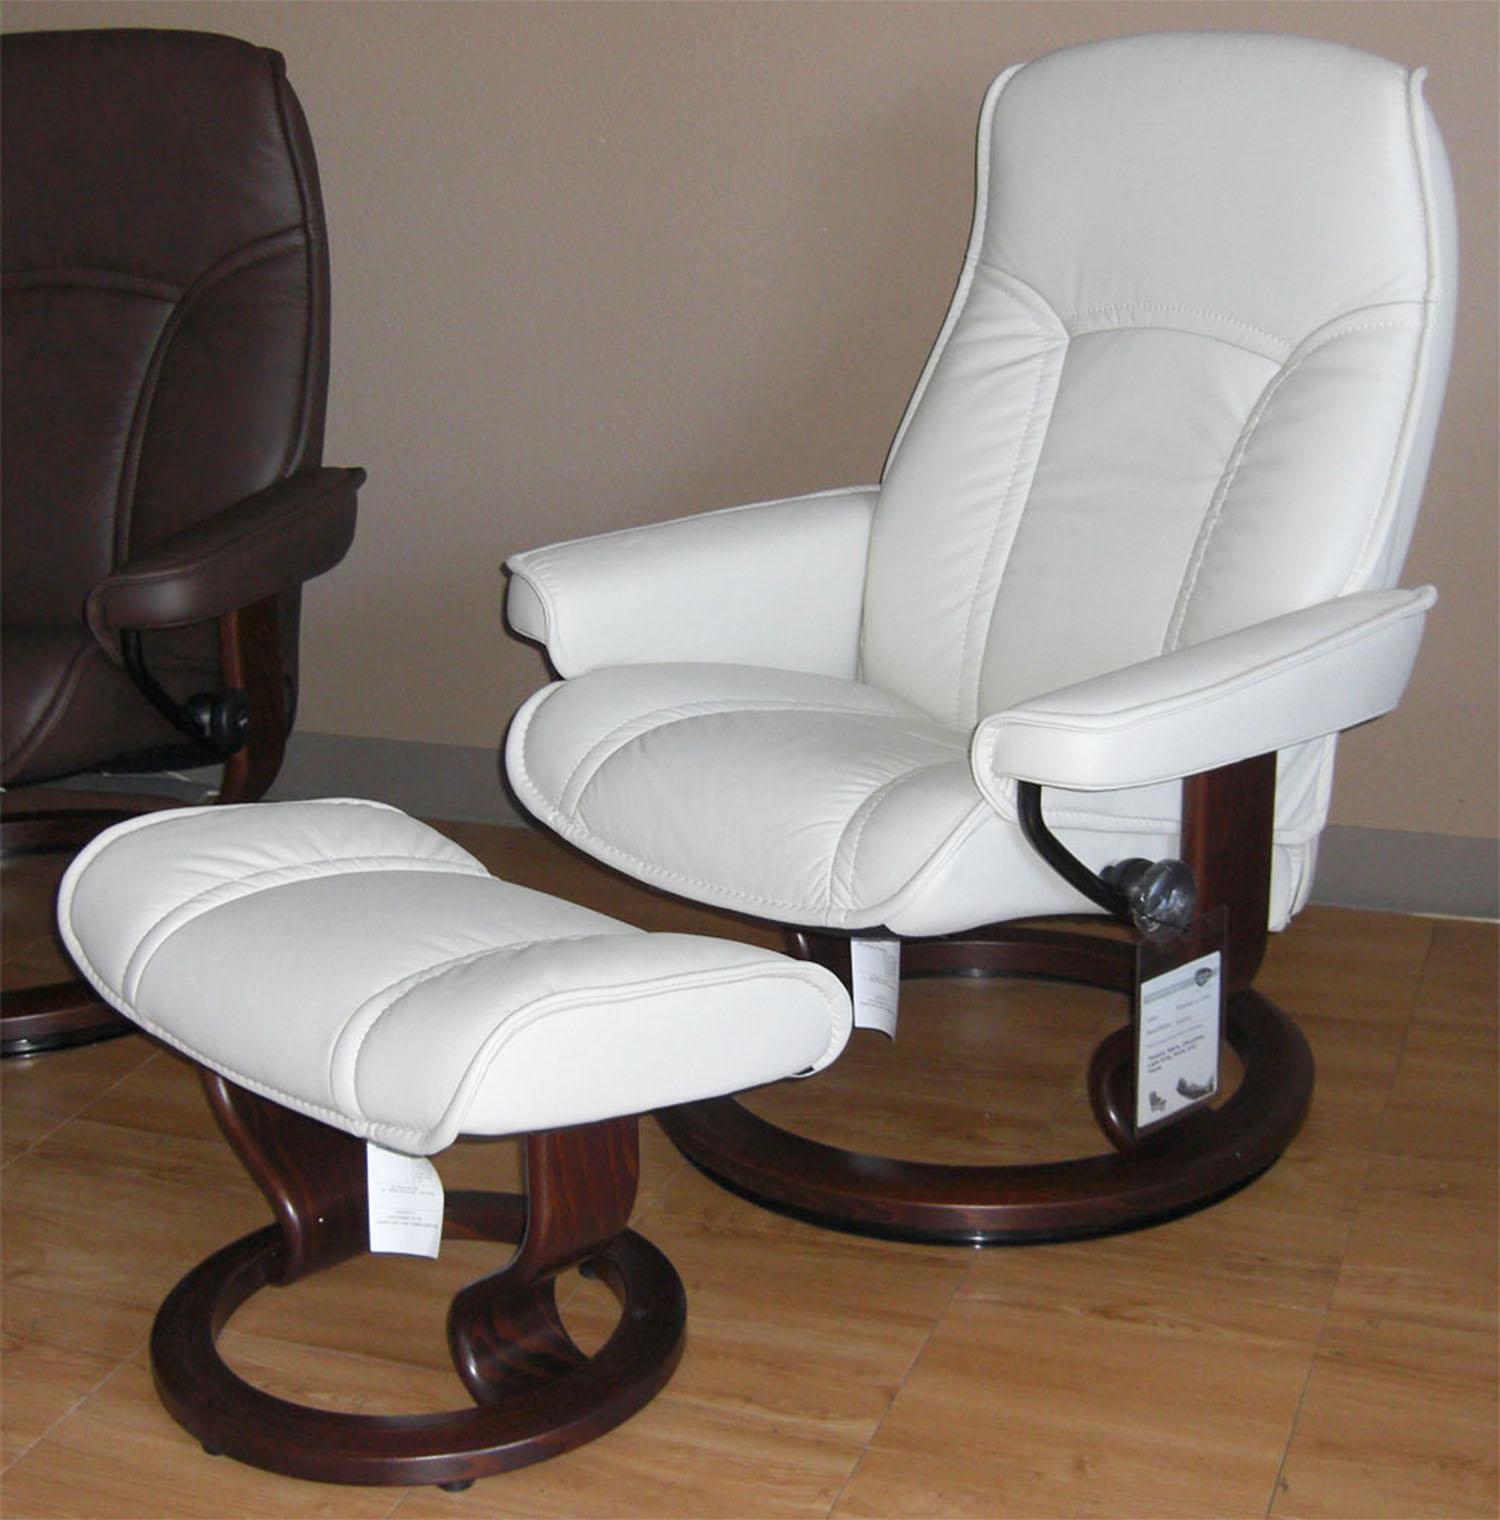 grey leather recliner. Stressless Governor Paloma Light Grey Leather Recliner Chair And Ottoman By Ekornes